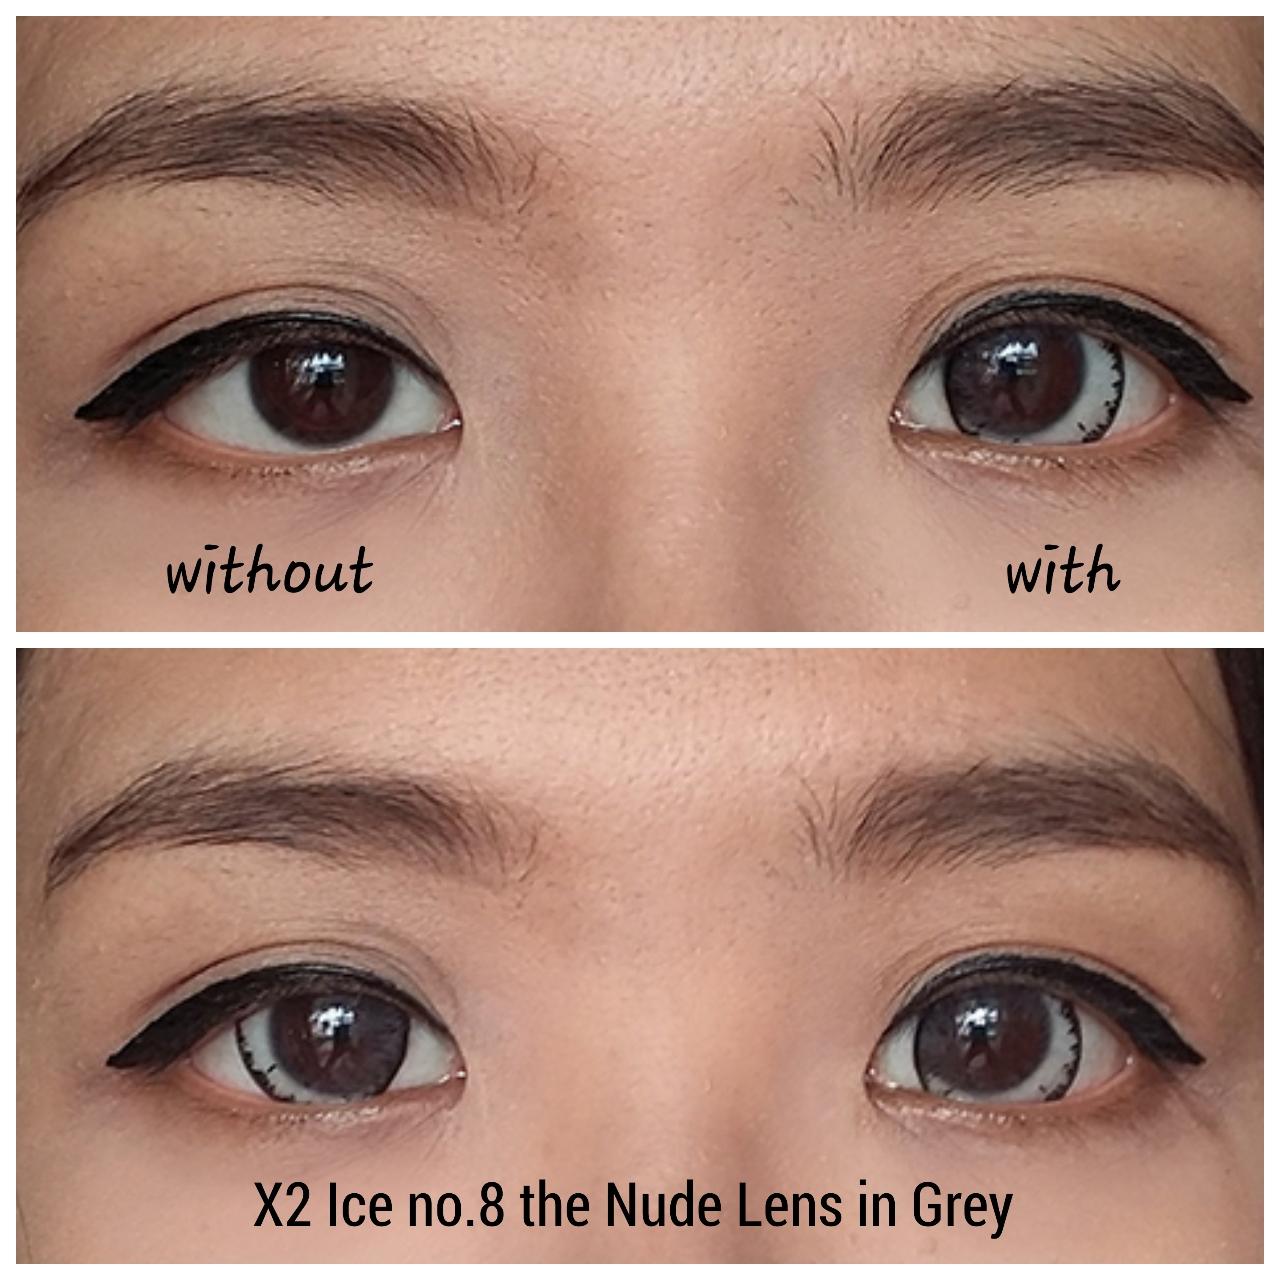 X2 Ice Nude N8 Softlens - Minus 2.00- Gray + Gratis Lenscase ... a1251fe175